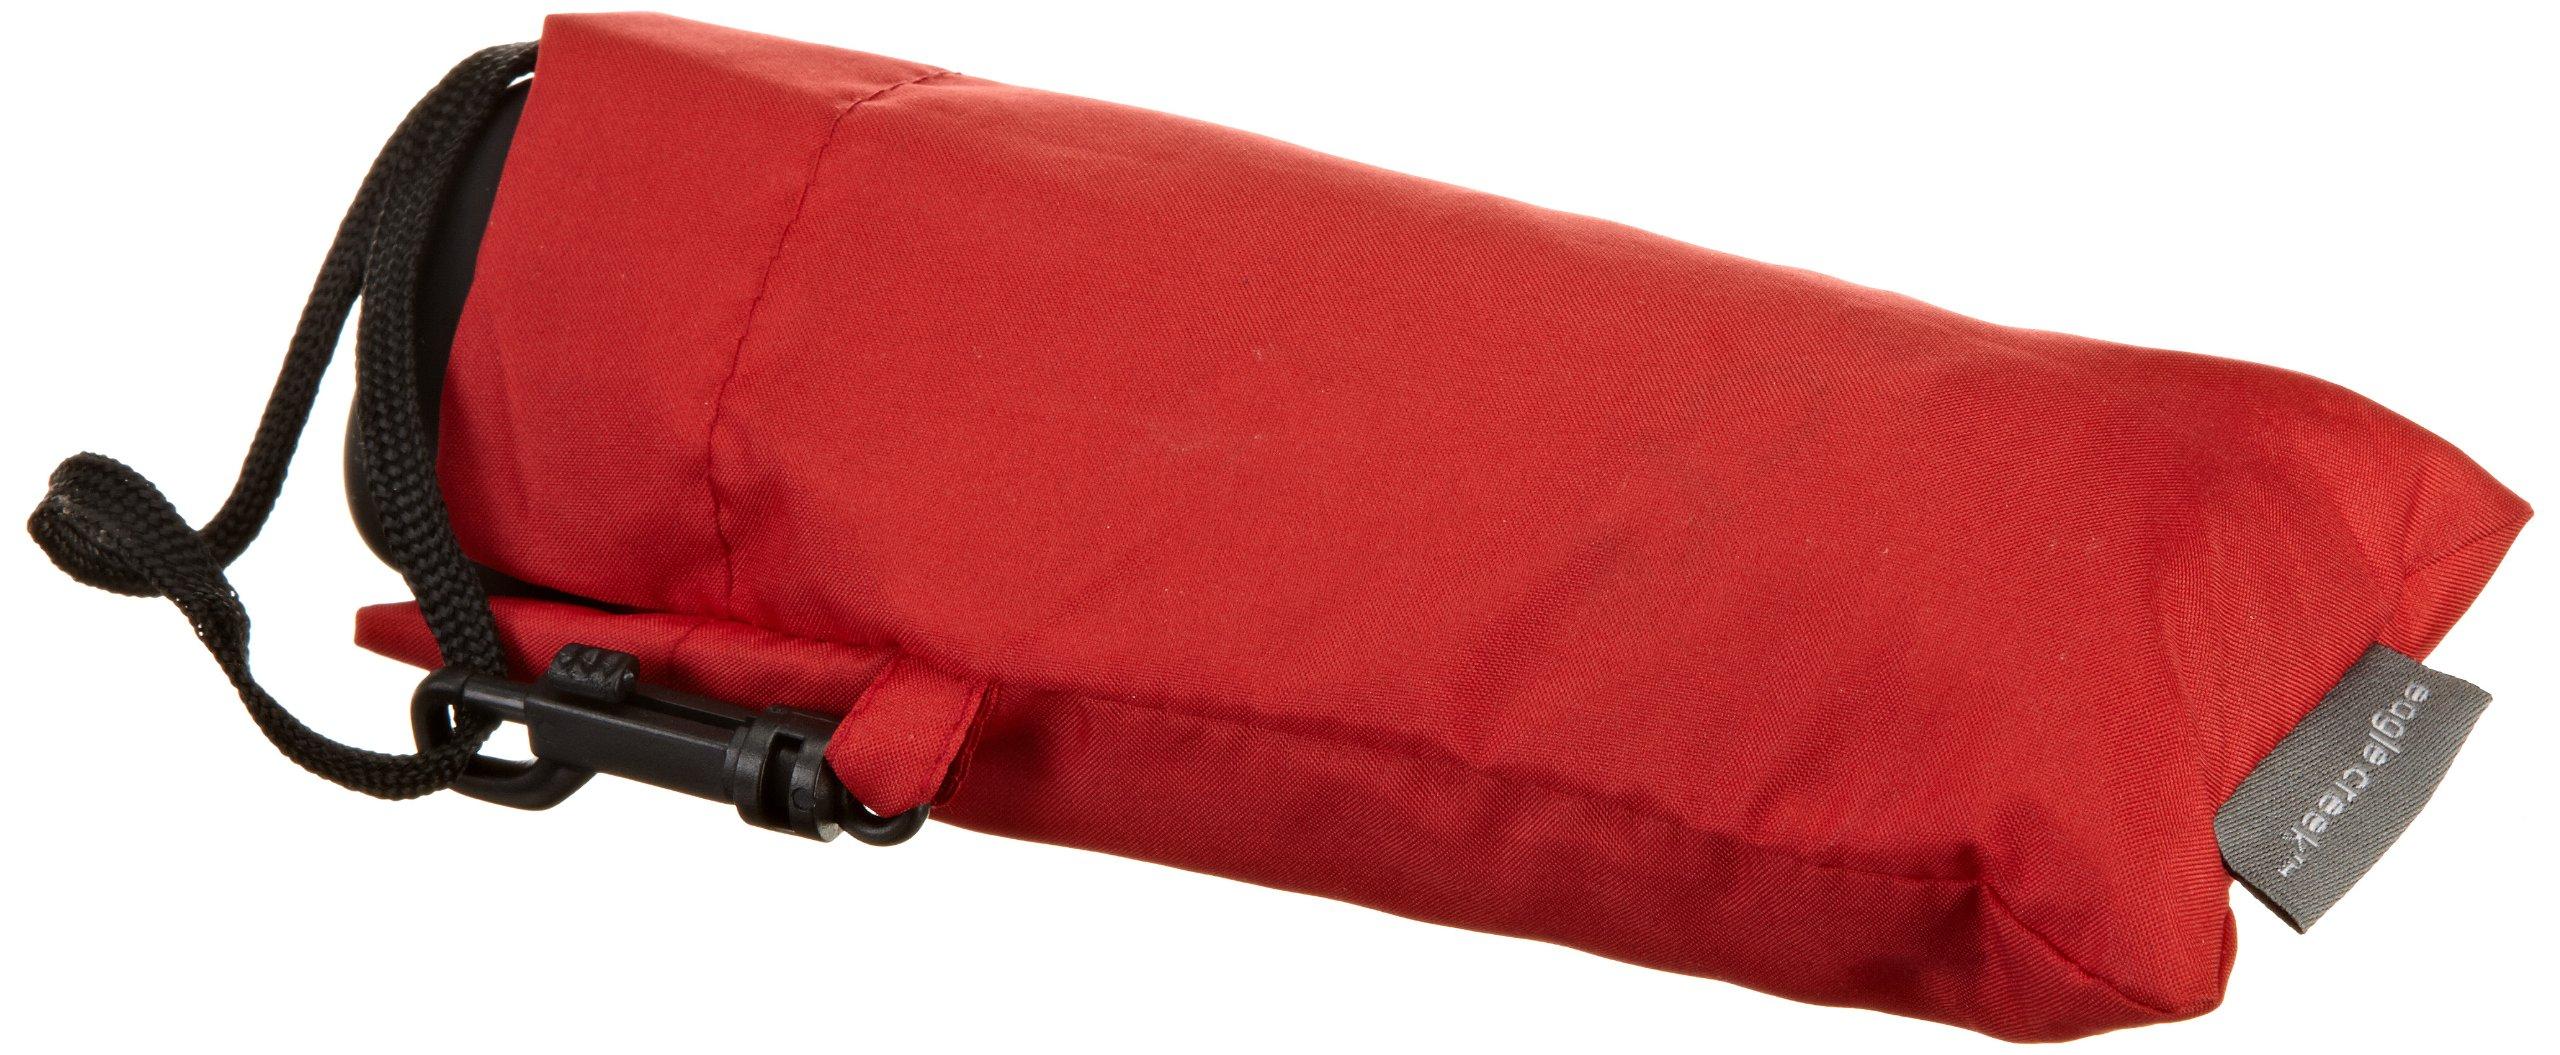 Eagle Creek Luggage Rain Away Travel Umbrella by Eagle Creek (Image #3)